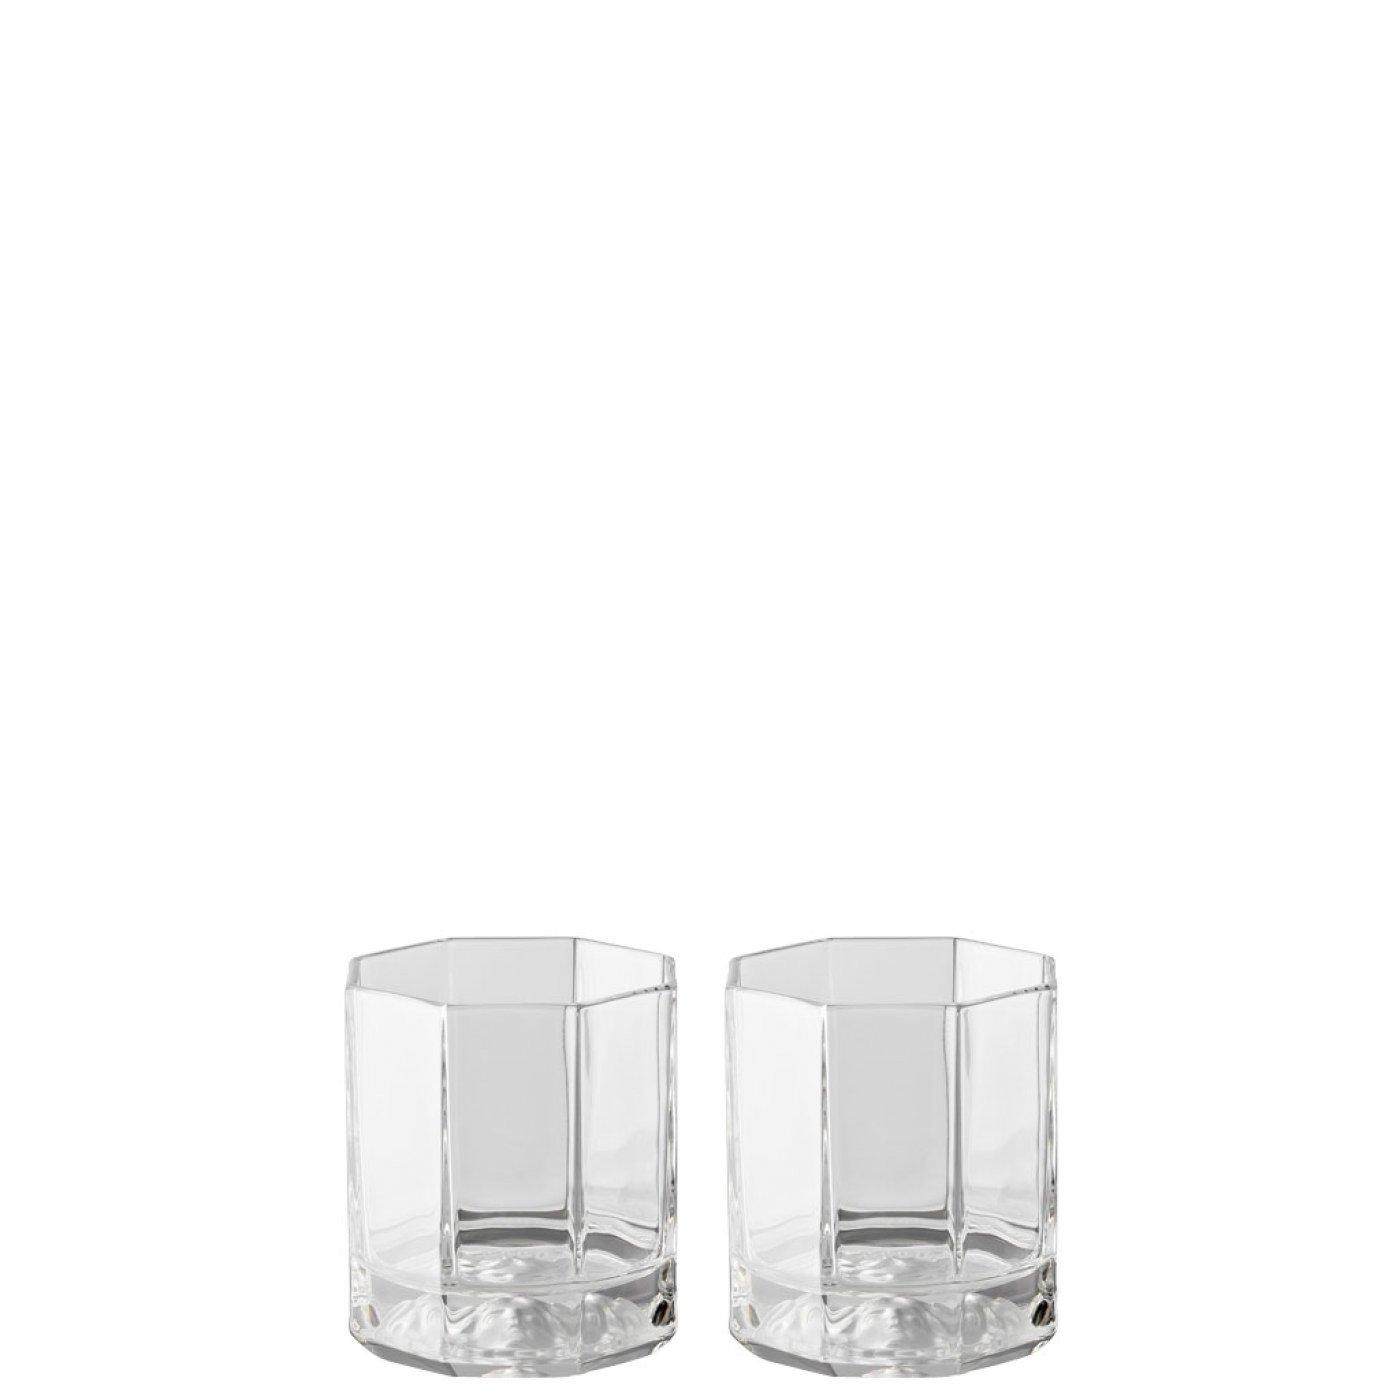 Rosenthal Versace Whiskey Glasses Medusa Lumiere / Elegant Crystal Glassware Designed by Gianni Versace / Set of 2 Tumblers